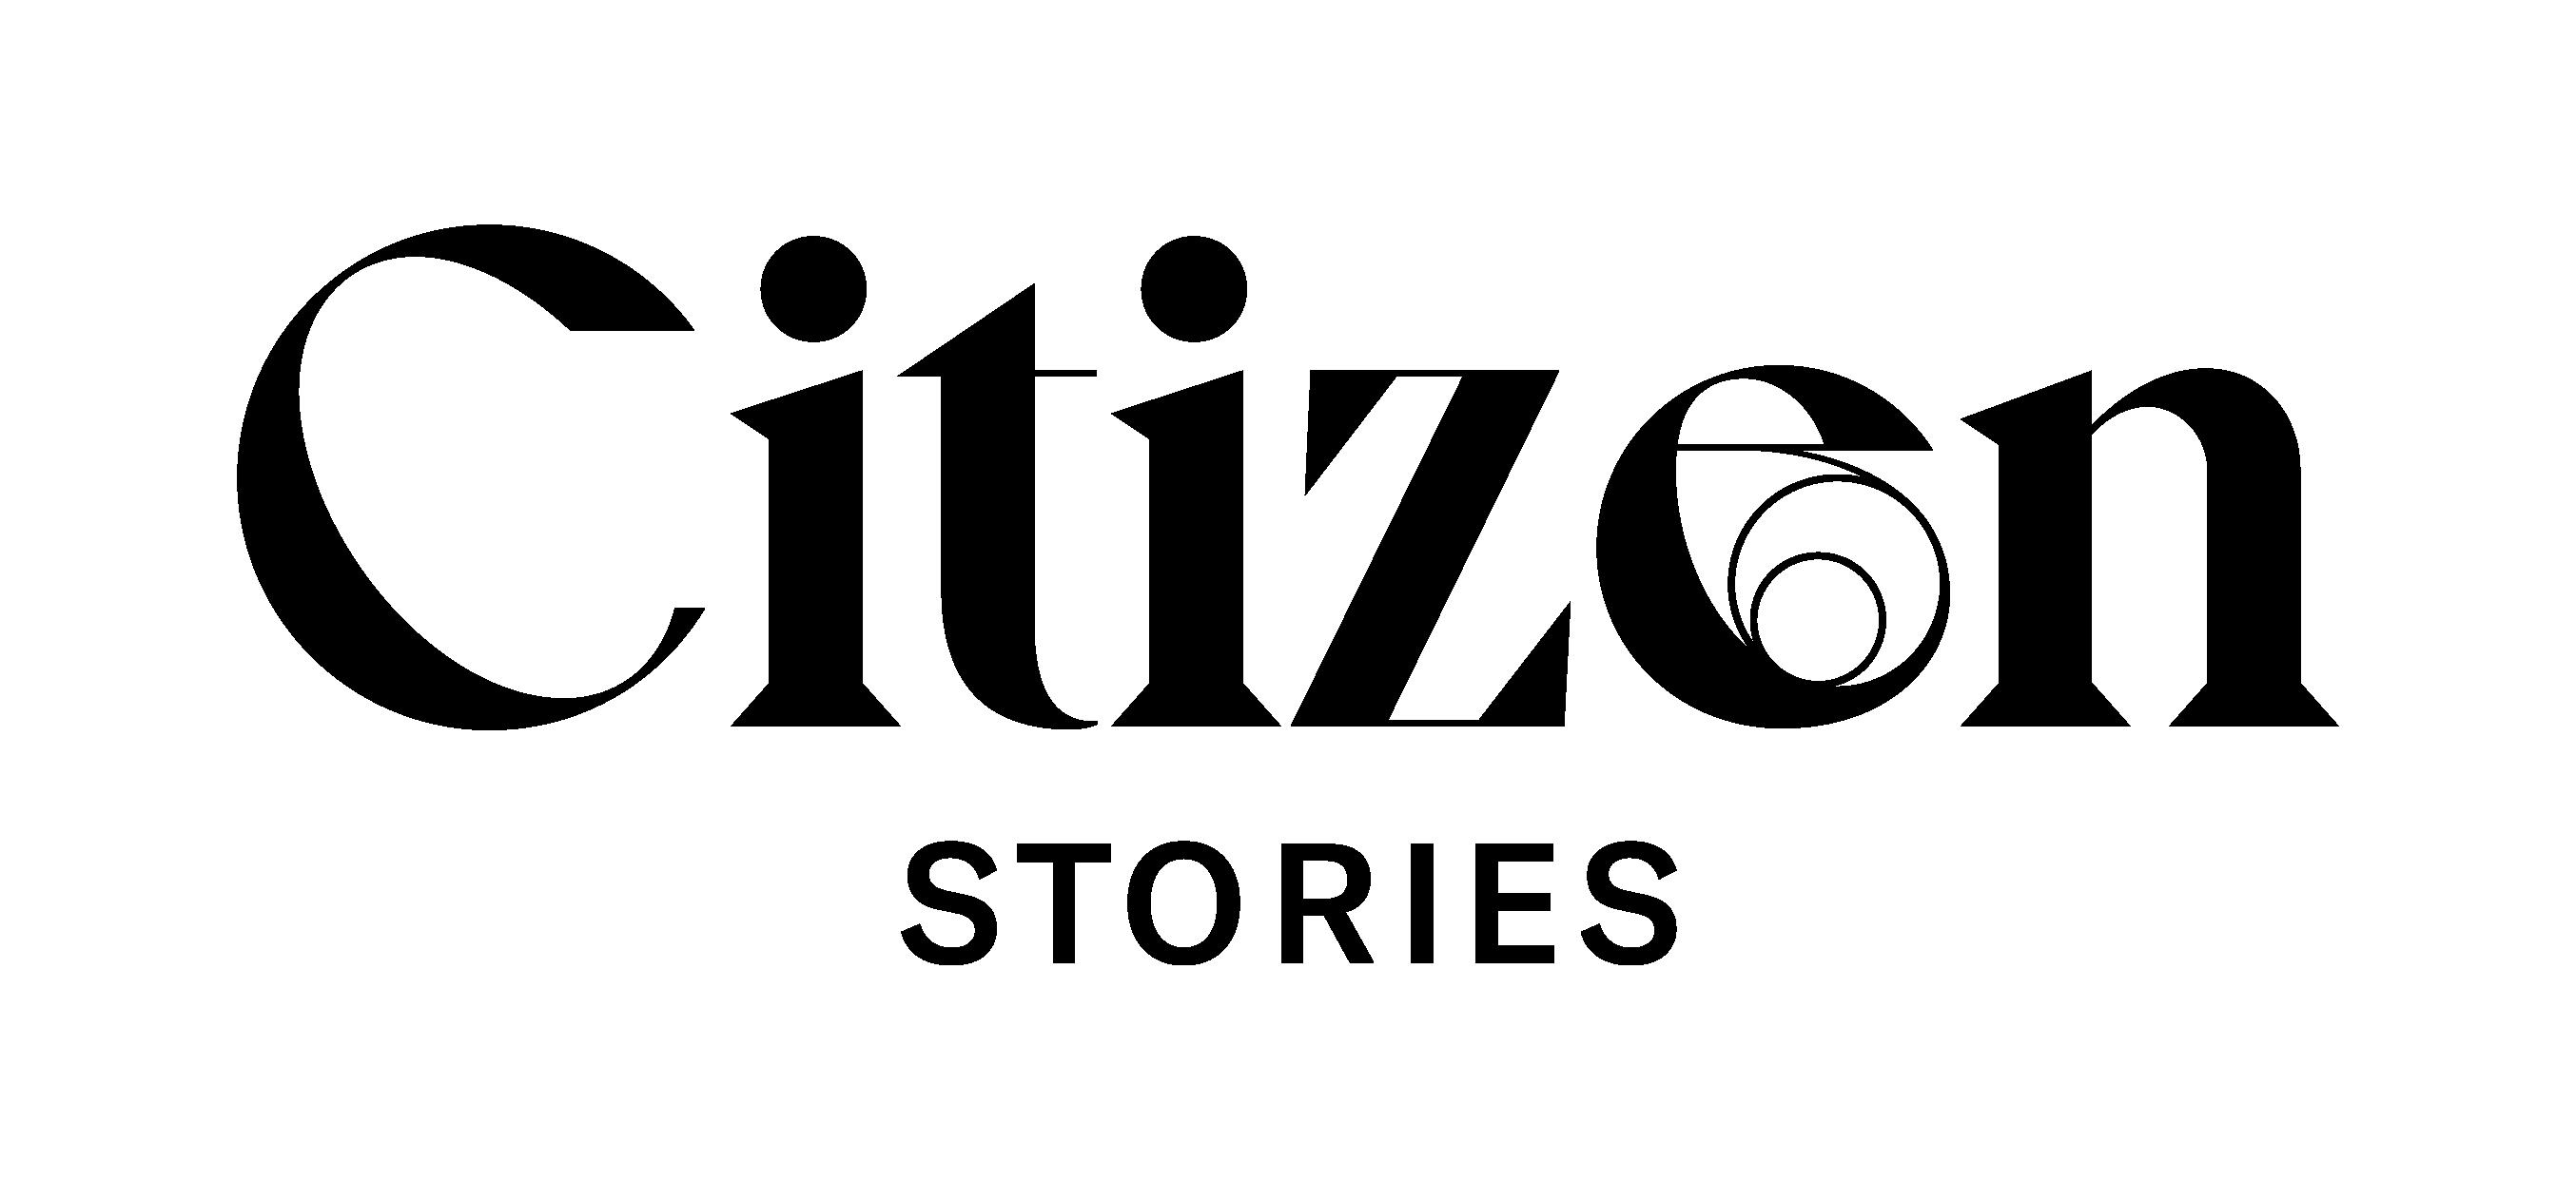 Citizen_Stories_Logo_BLK